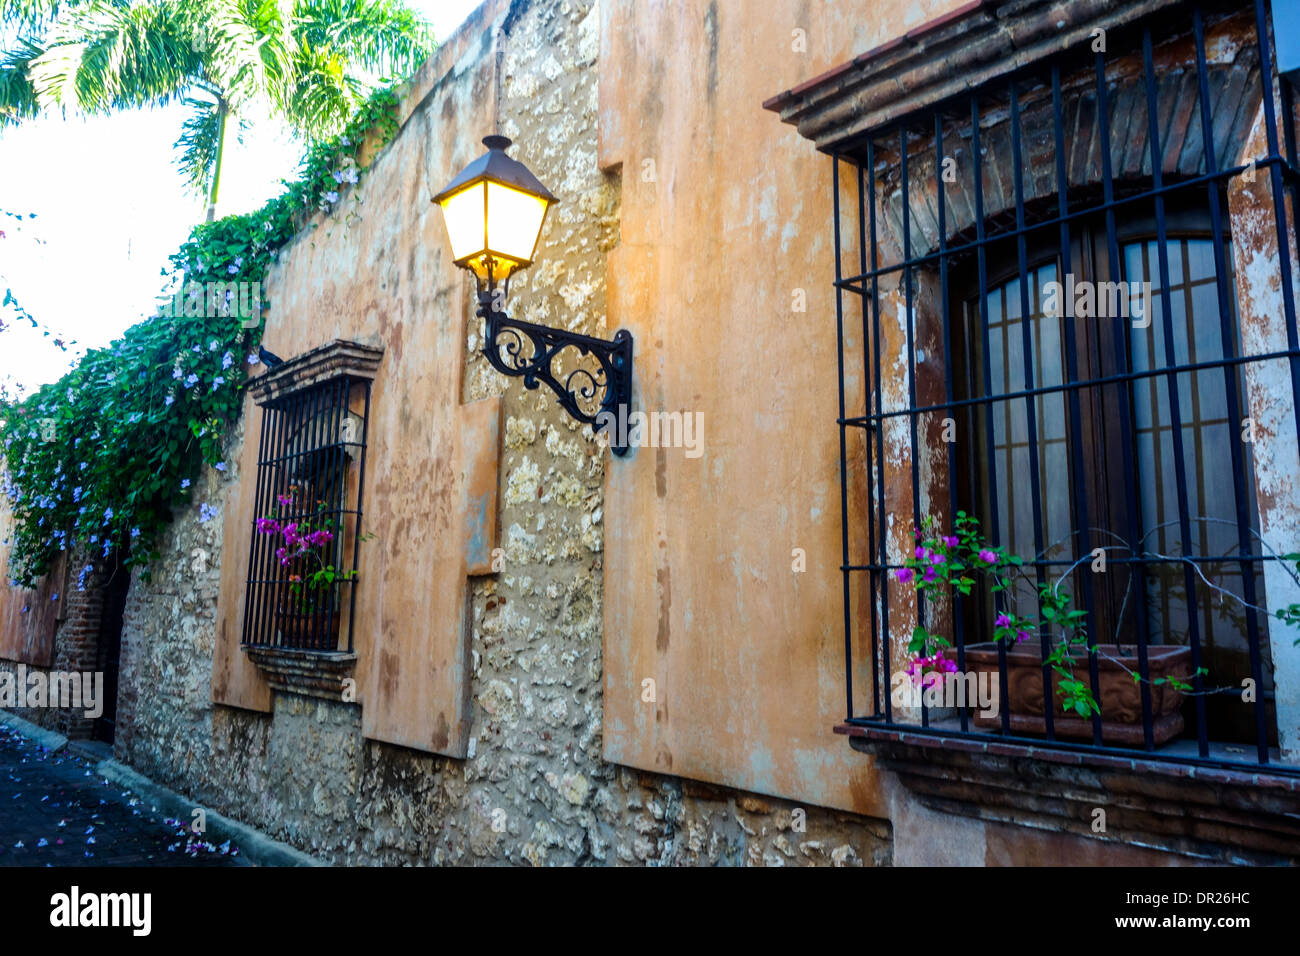 old street in the Zona Colonial; Santo Domingo; Dominican Republic - Stock Image